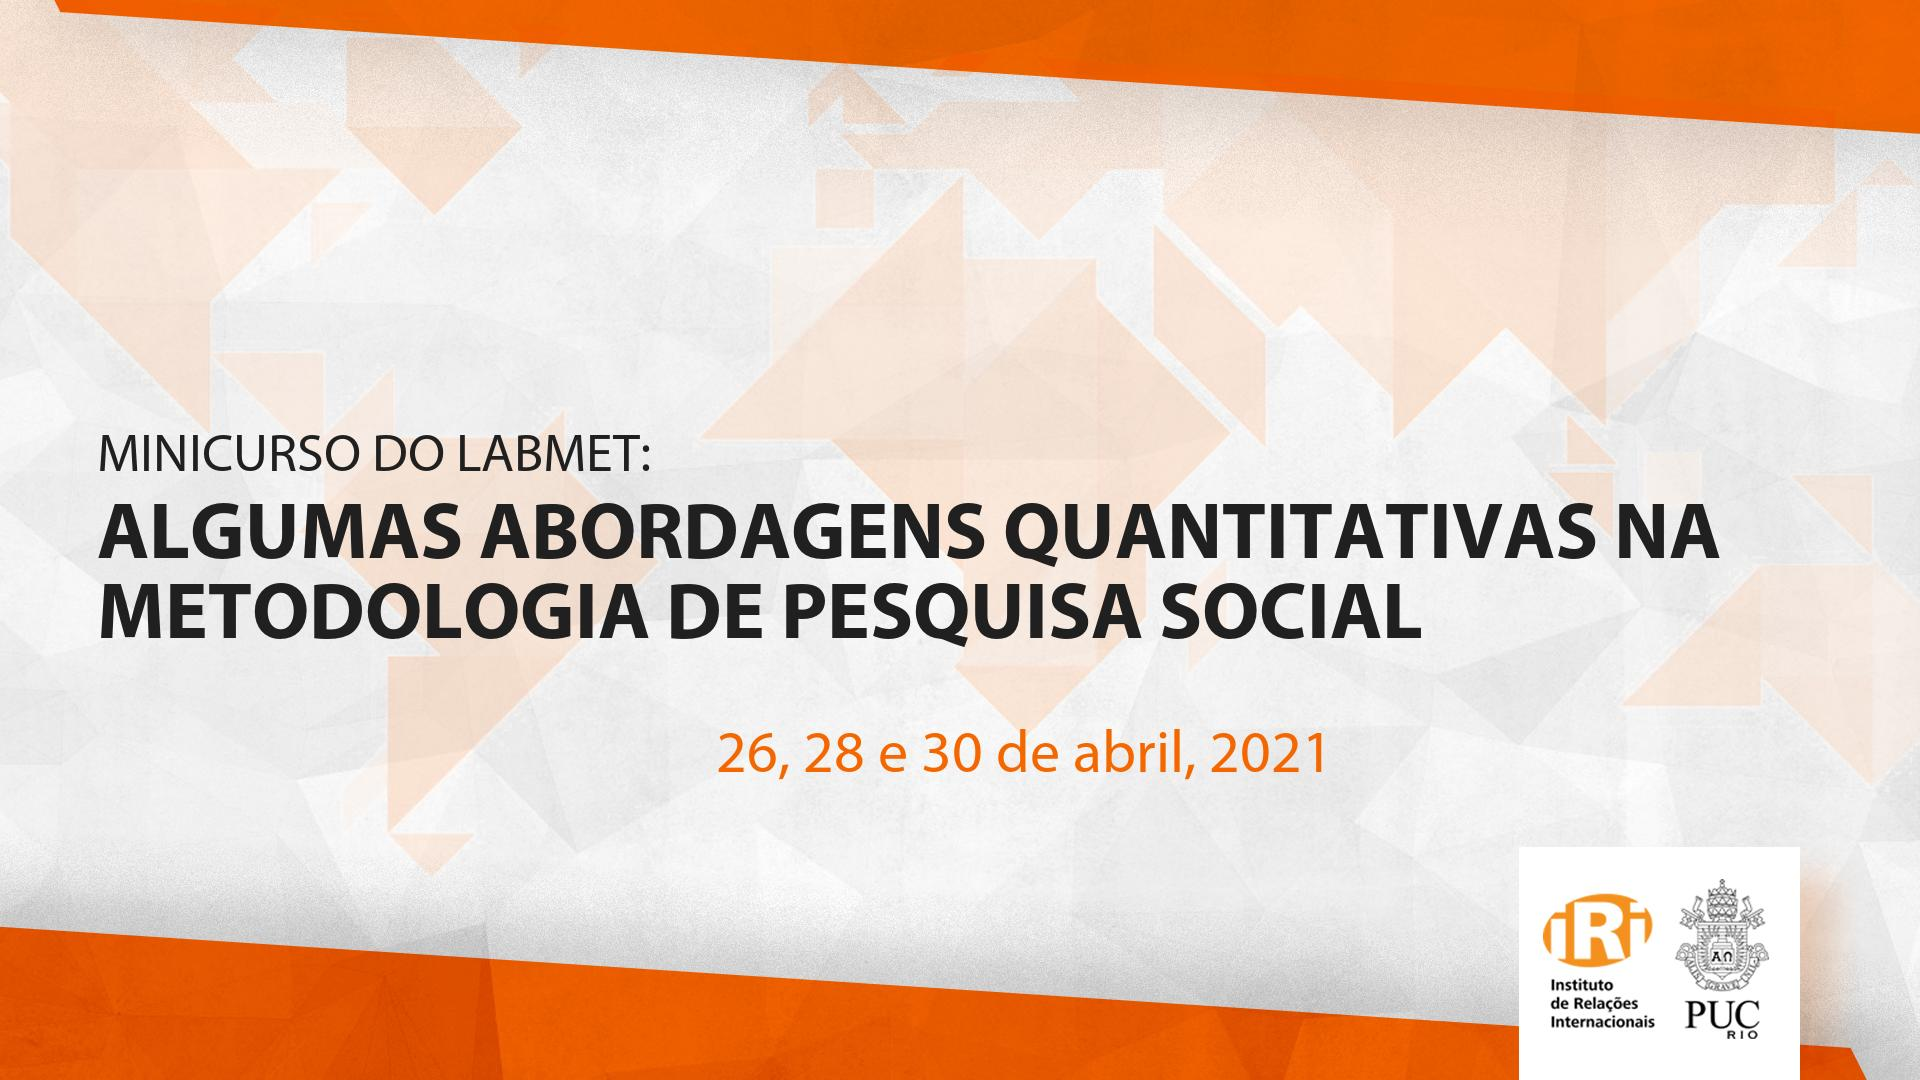 Algumas abordagens quantitativas na metodologia de pesquisa social